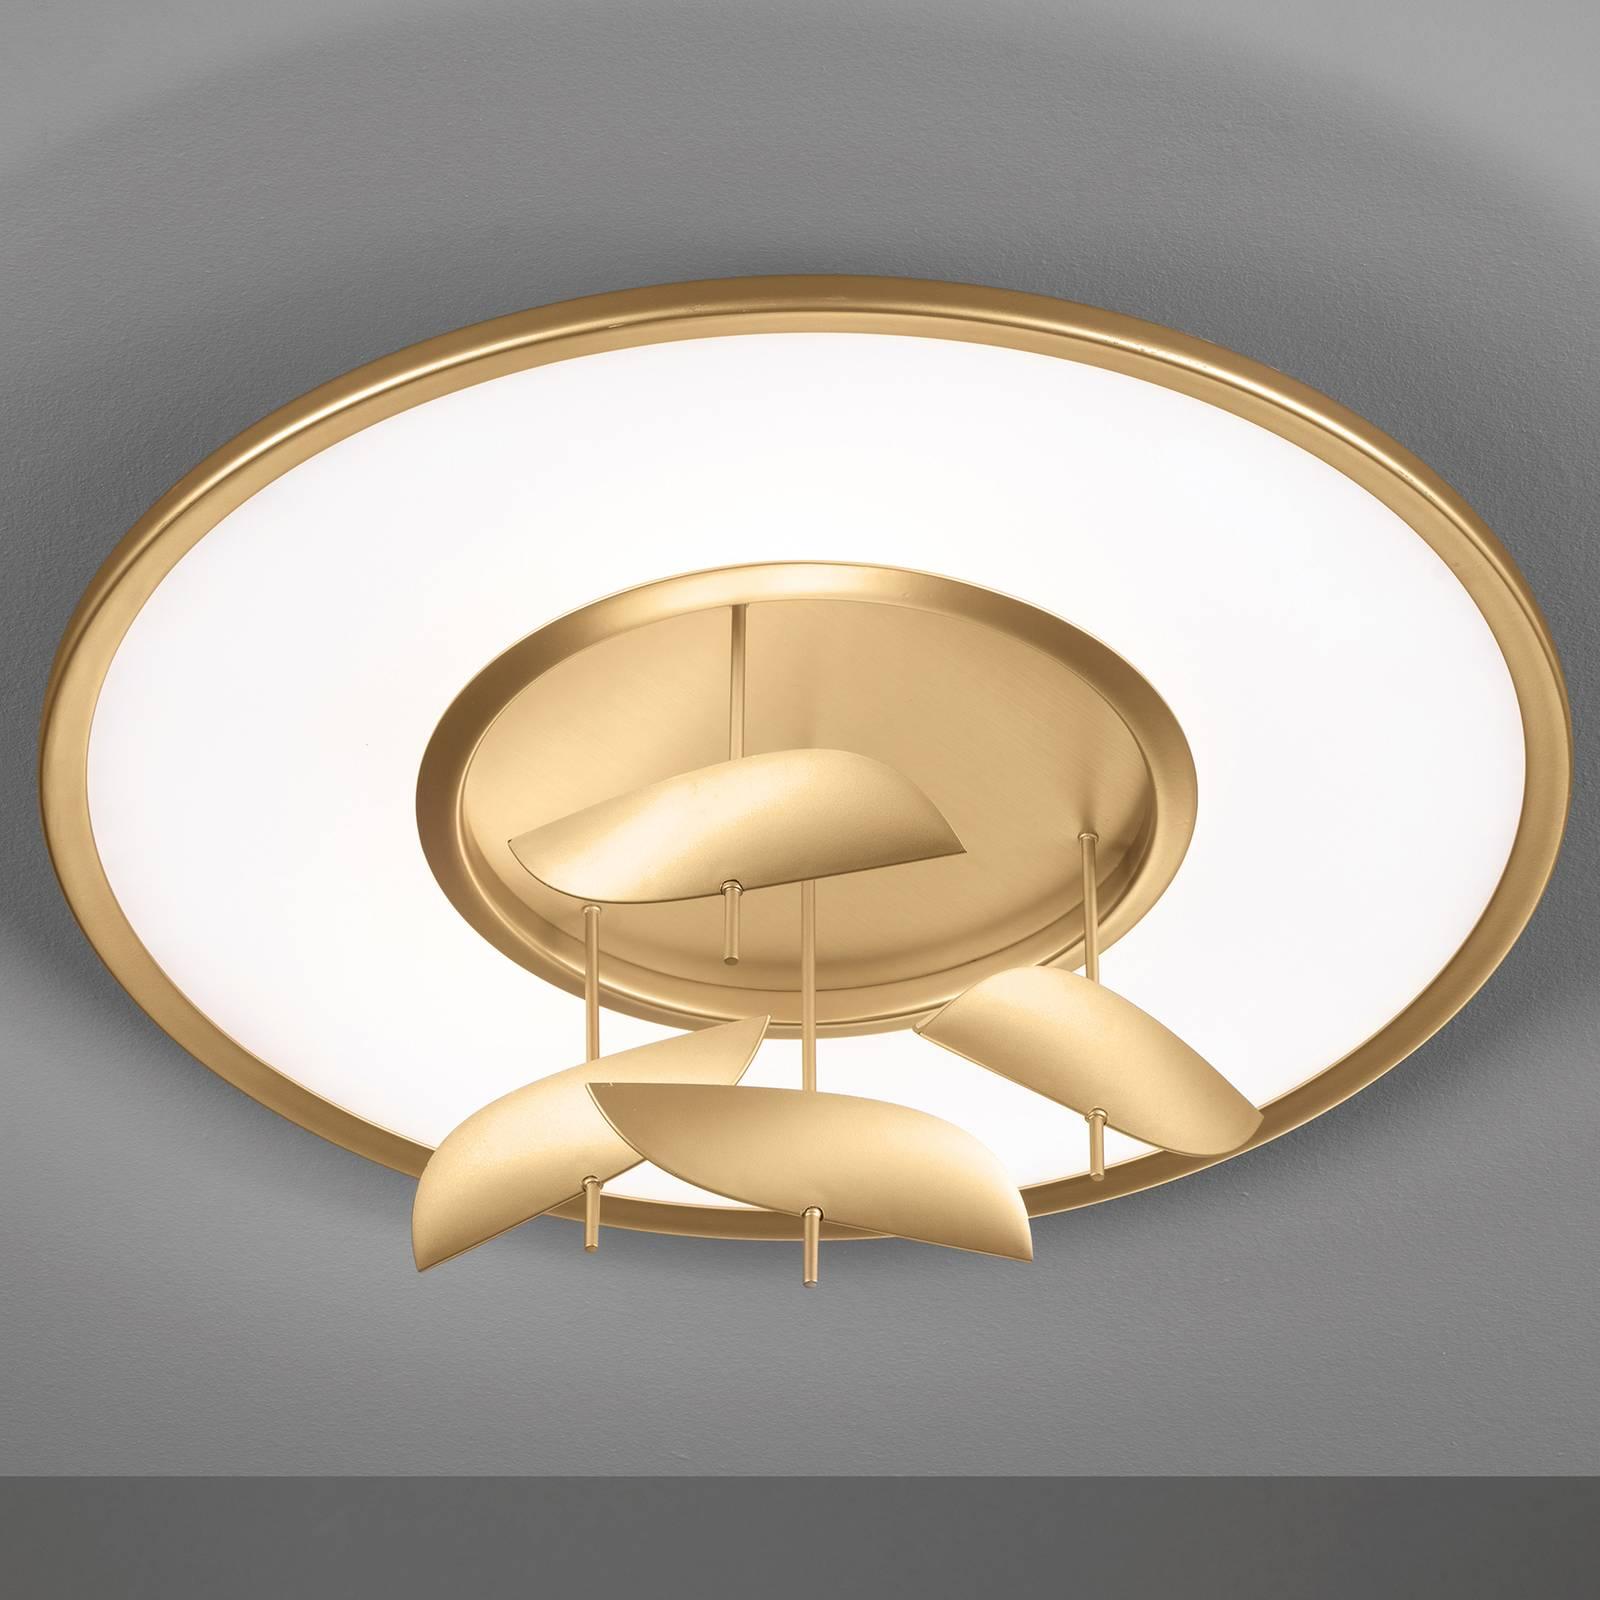 LED plafondlamp Dane, CCT, met afstandsbediening